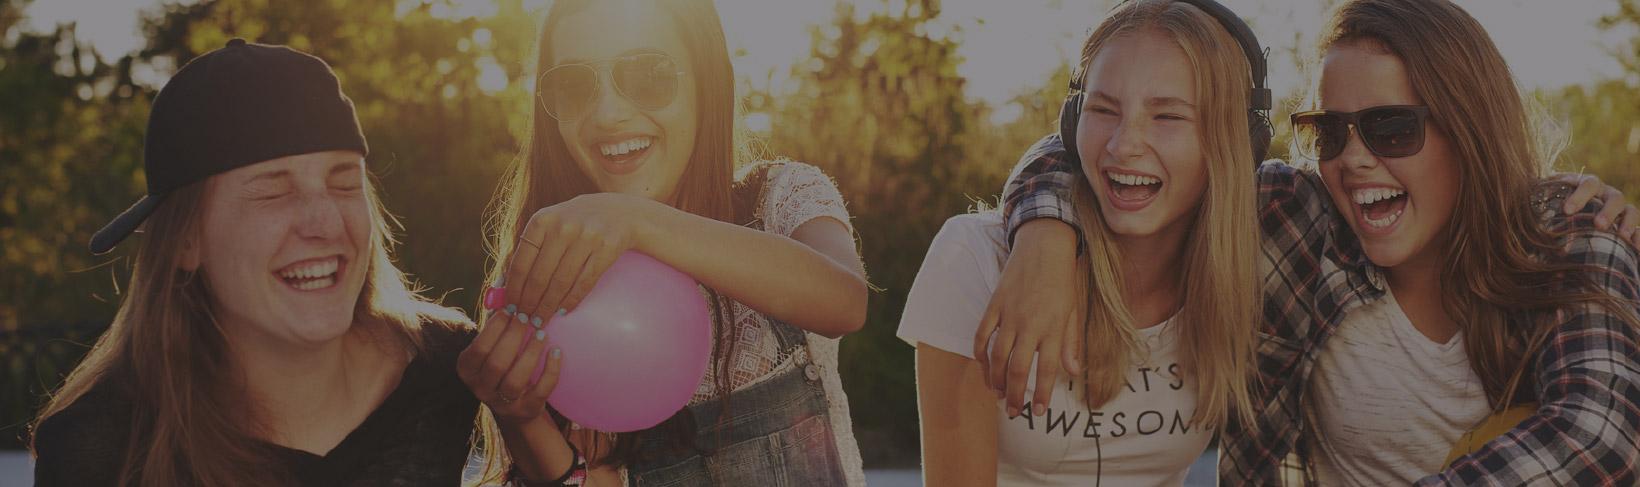 invisalign ortodoncia tres torres Barcelona sonrisa niñas